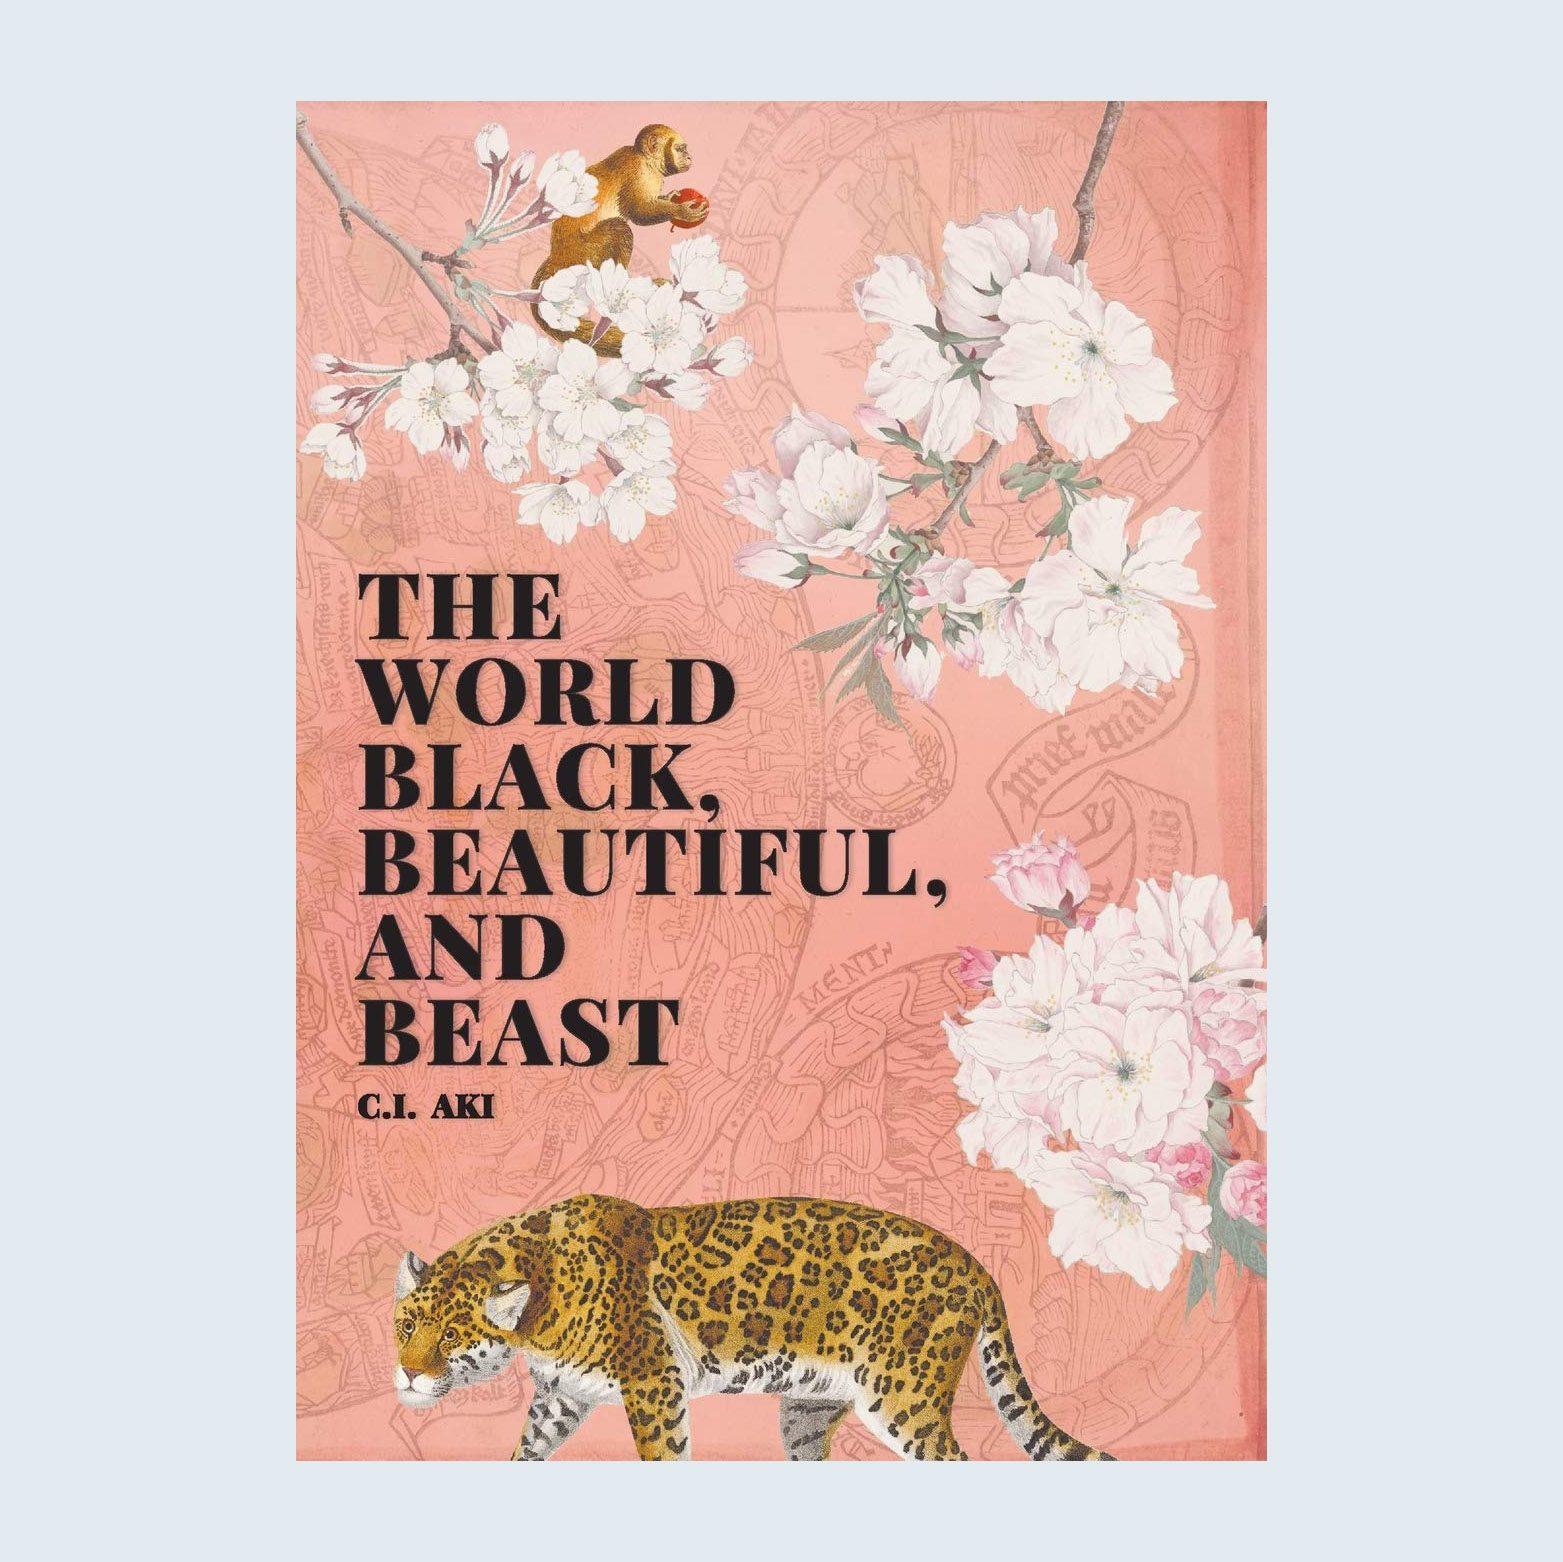 The World Black, Beautiful, and Beast by C.I. Aki